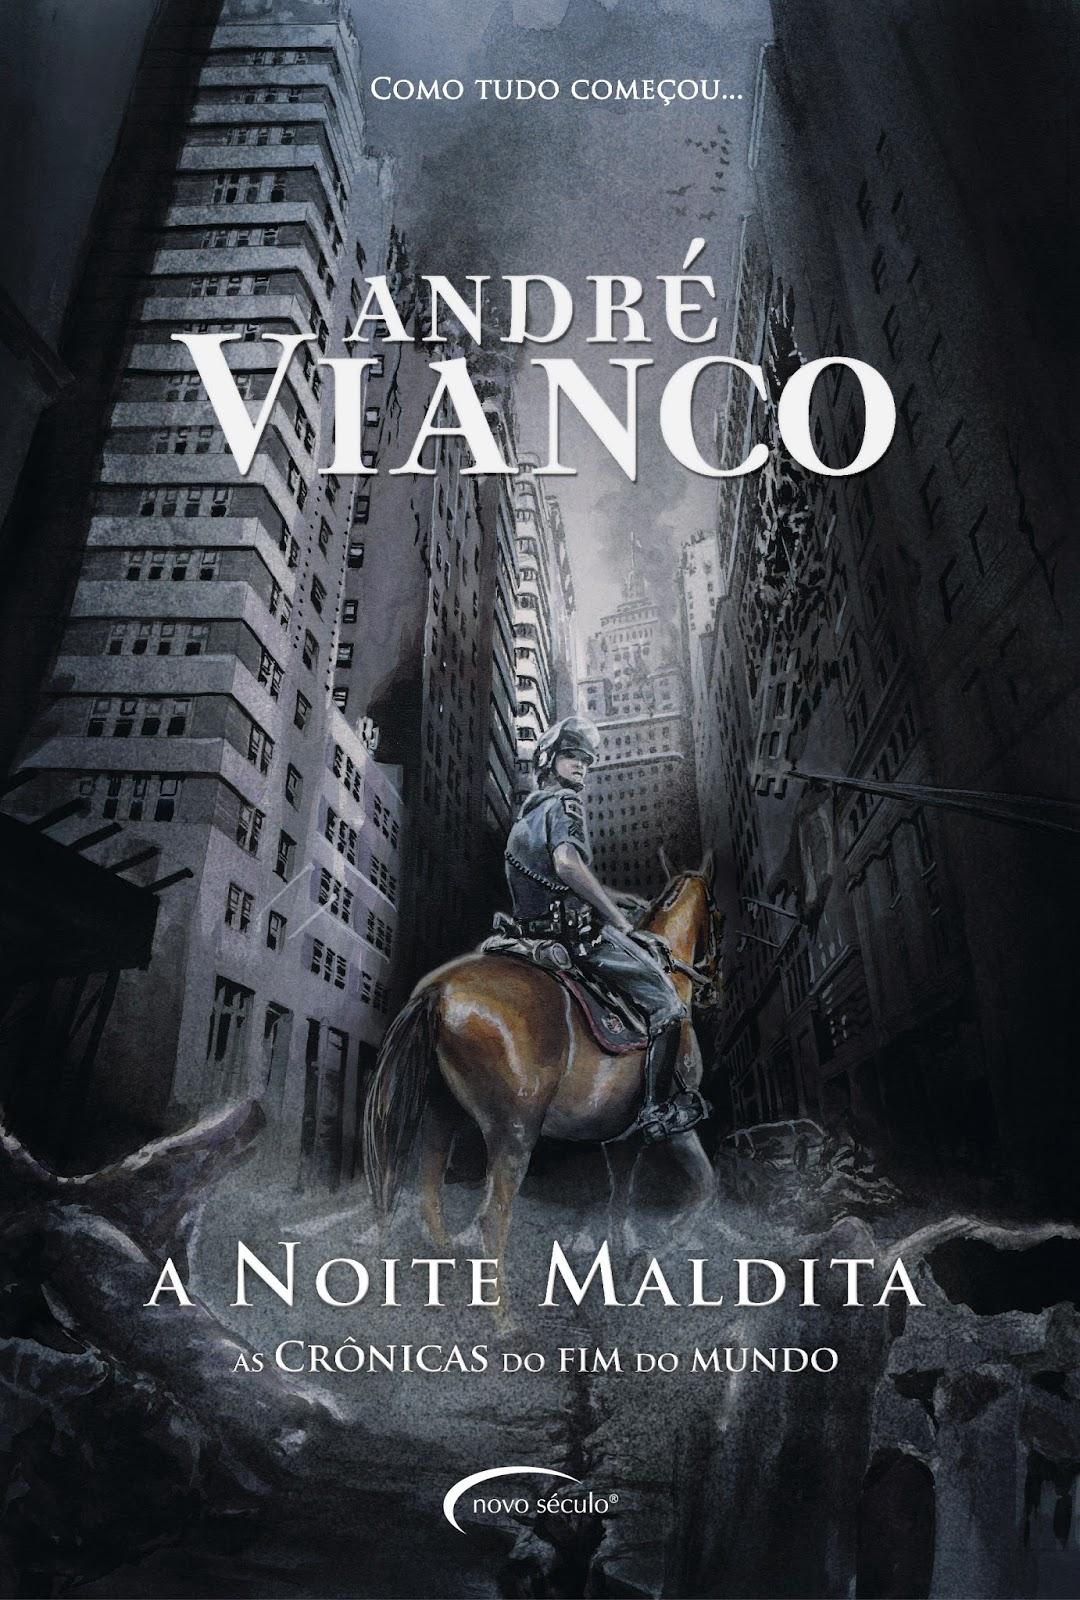 http://thebestwordsbr.blogspot.com.br/2014/01/a-noite-maldita-andre-vianco.html